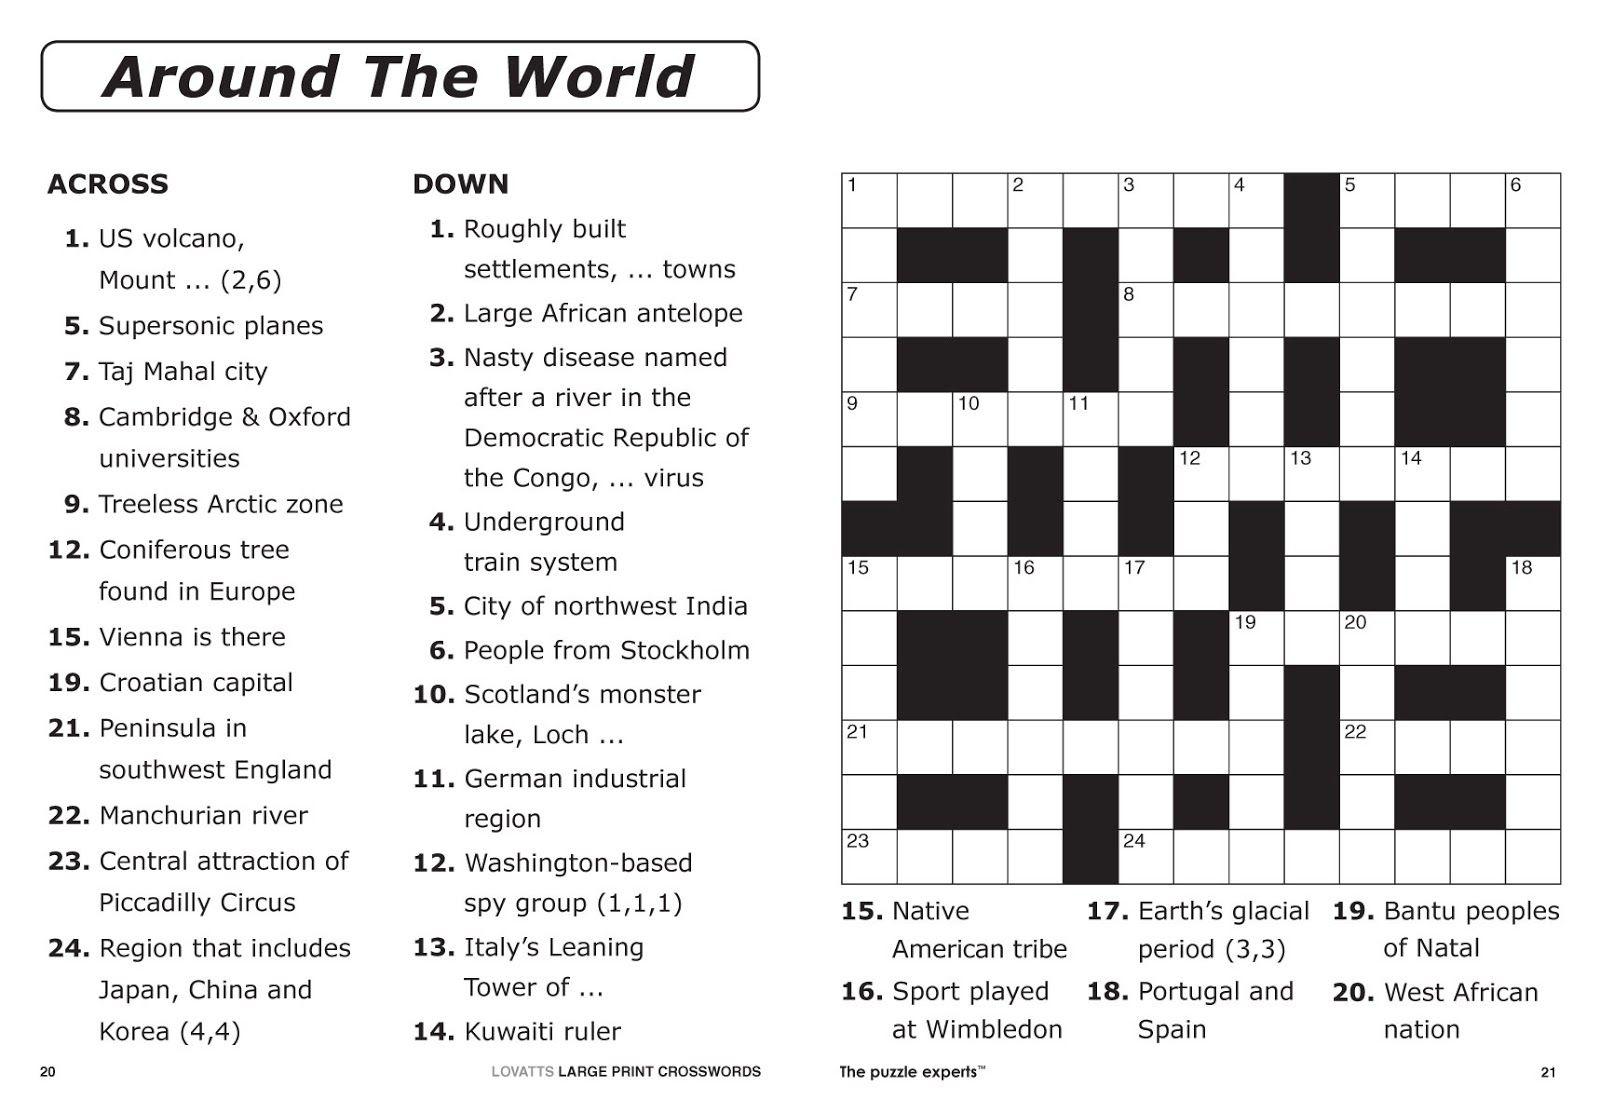 Free Printable Large Print Crossword Puzzles | M3U8 - Printable Crossword Puzzles 7 Year Old